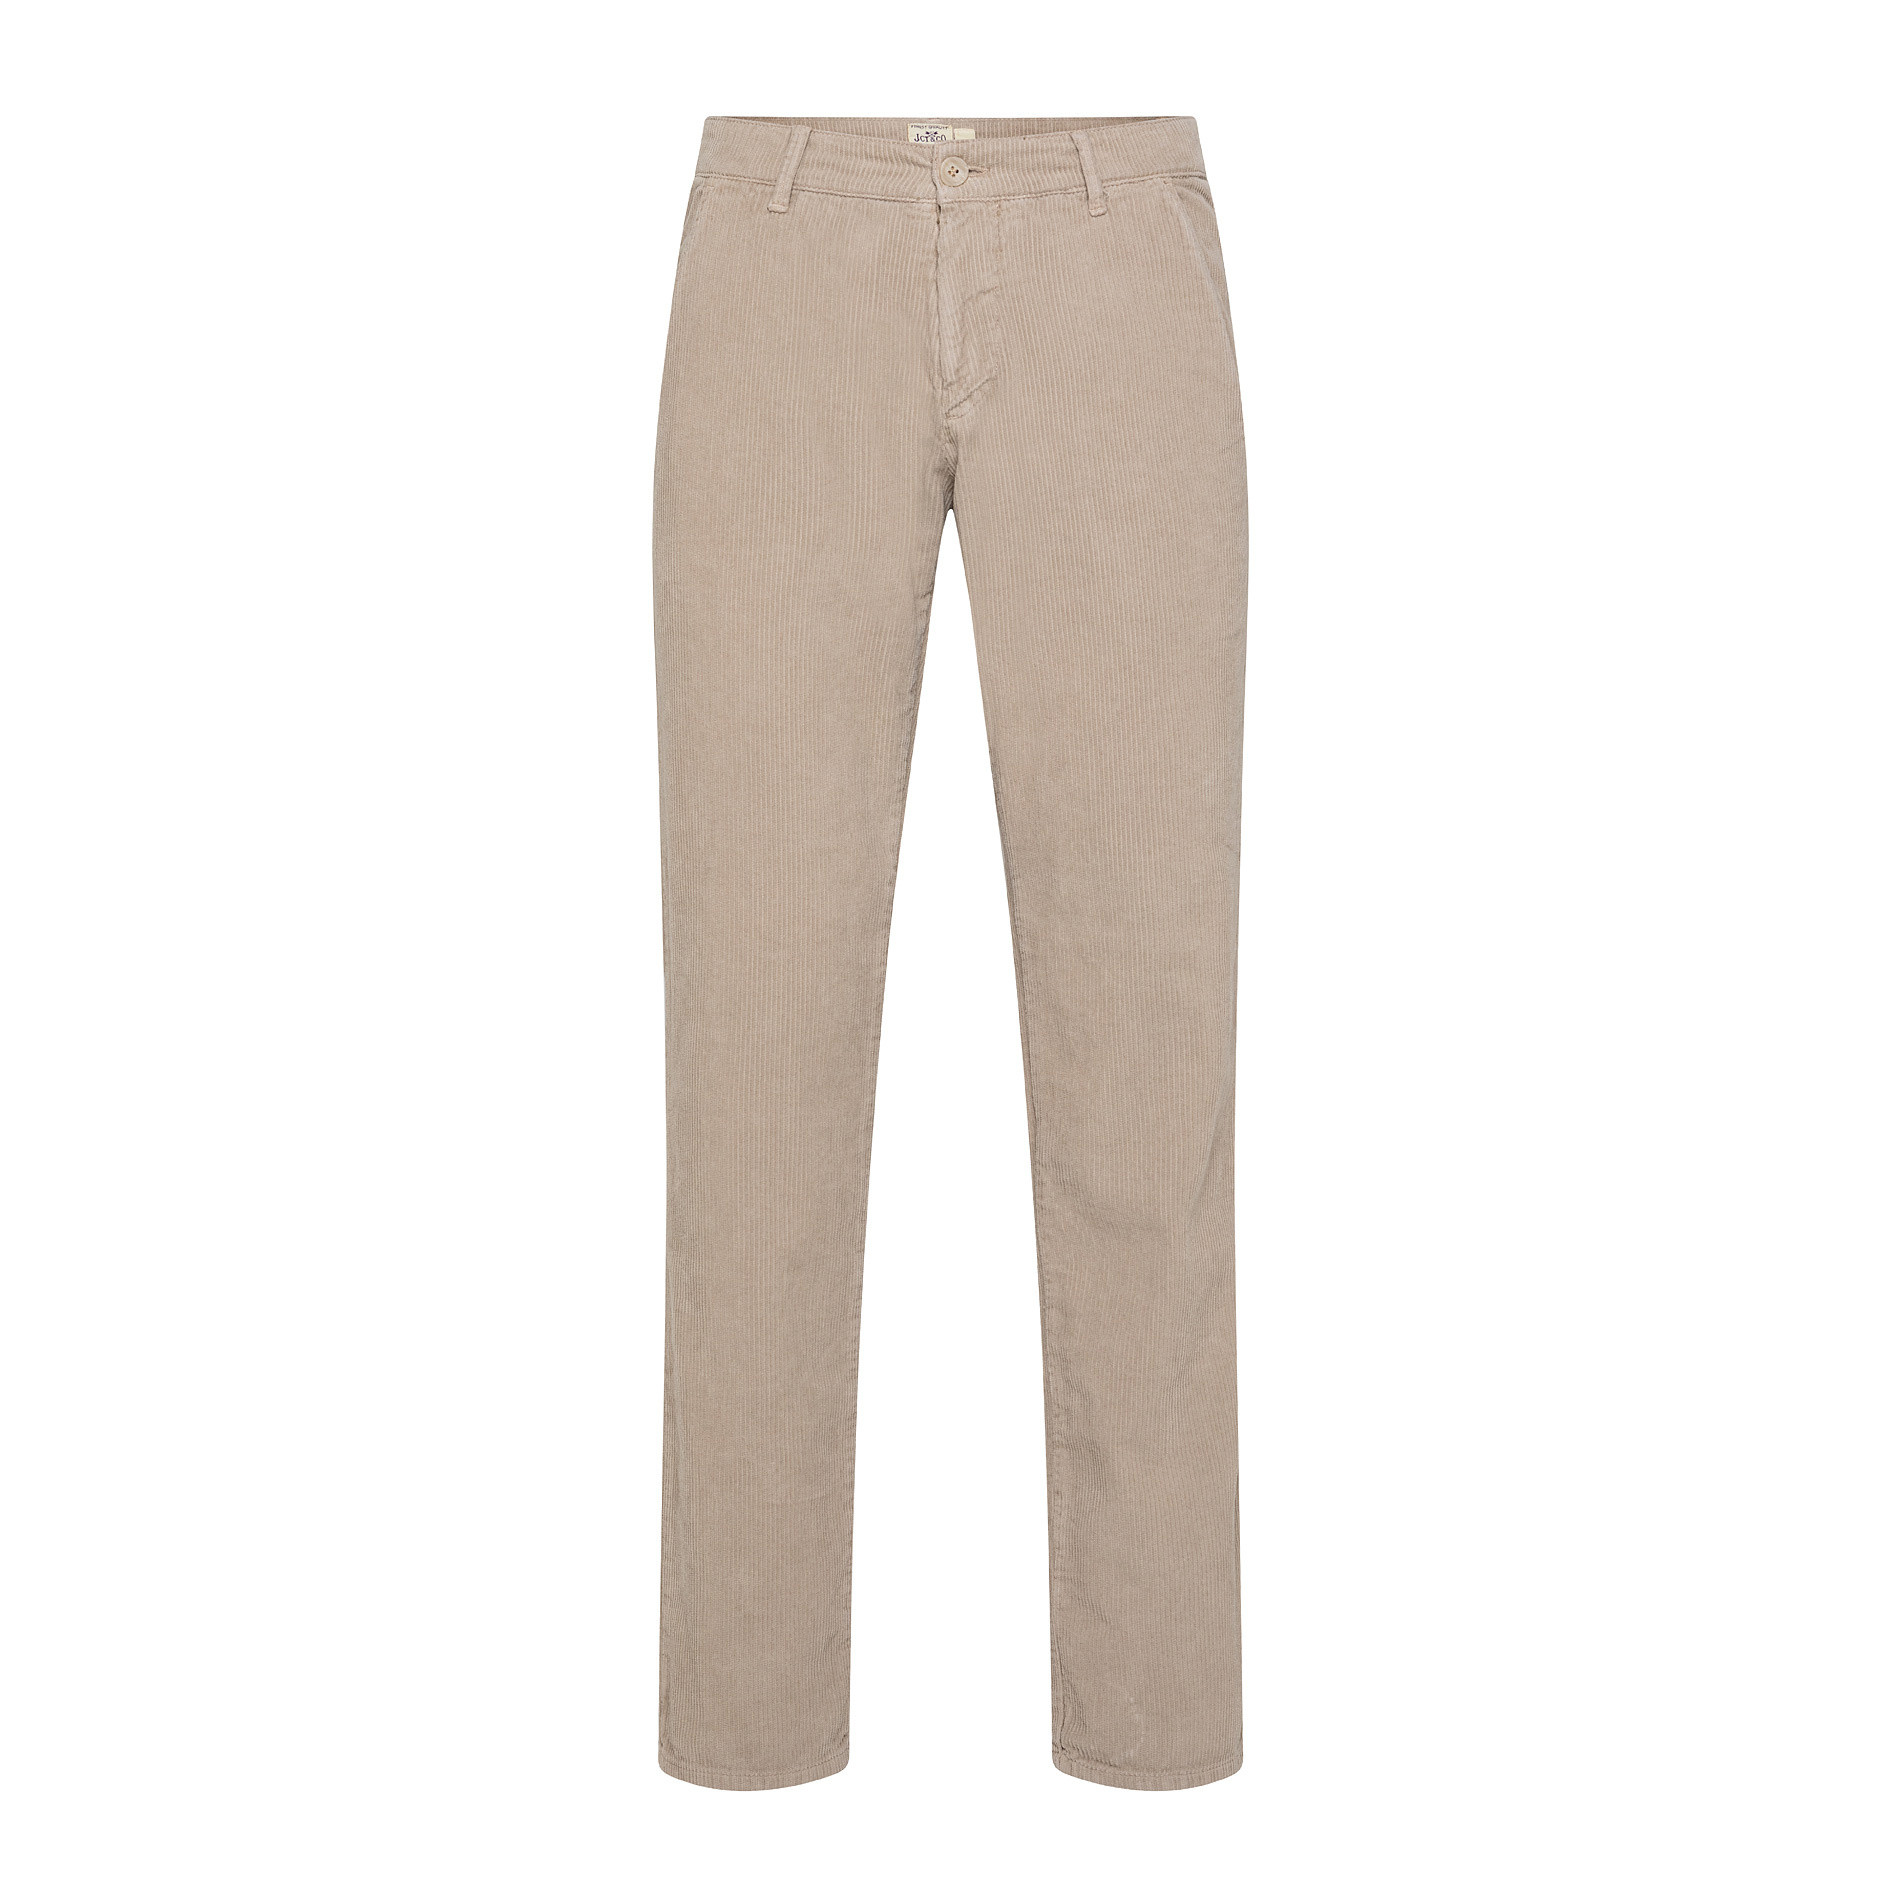 Pantaloni chino velluto stretch, Beige chiaro, large image number 0